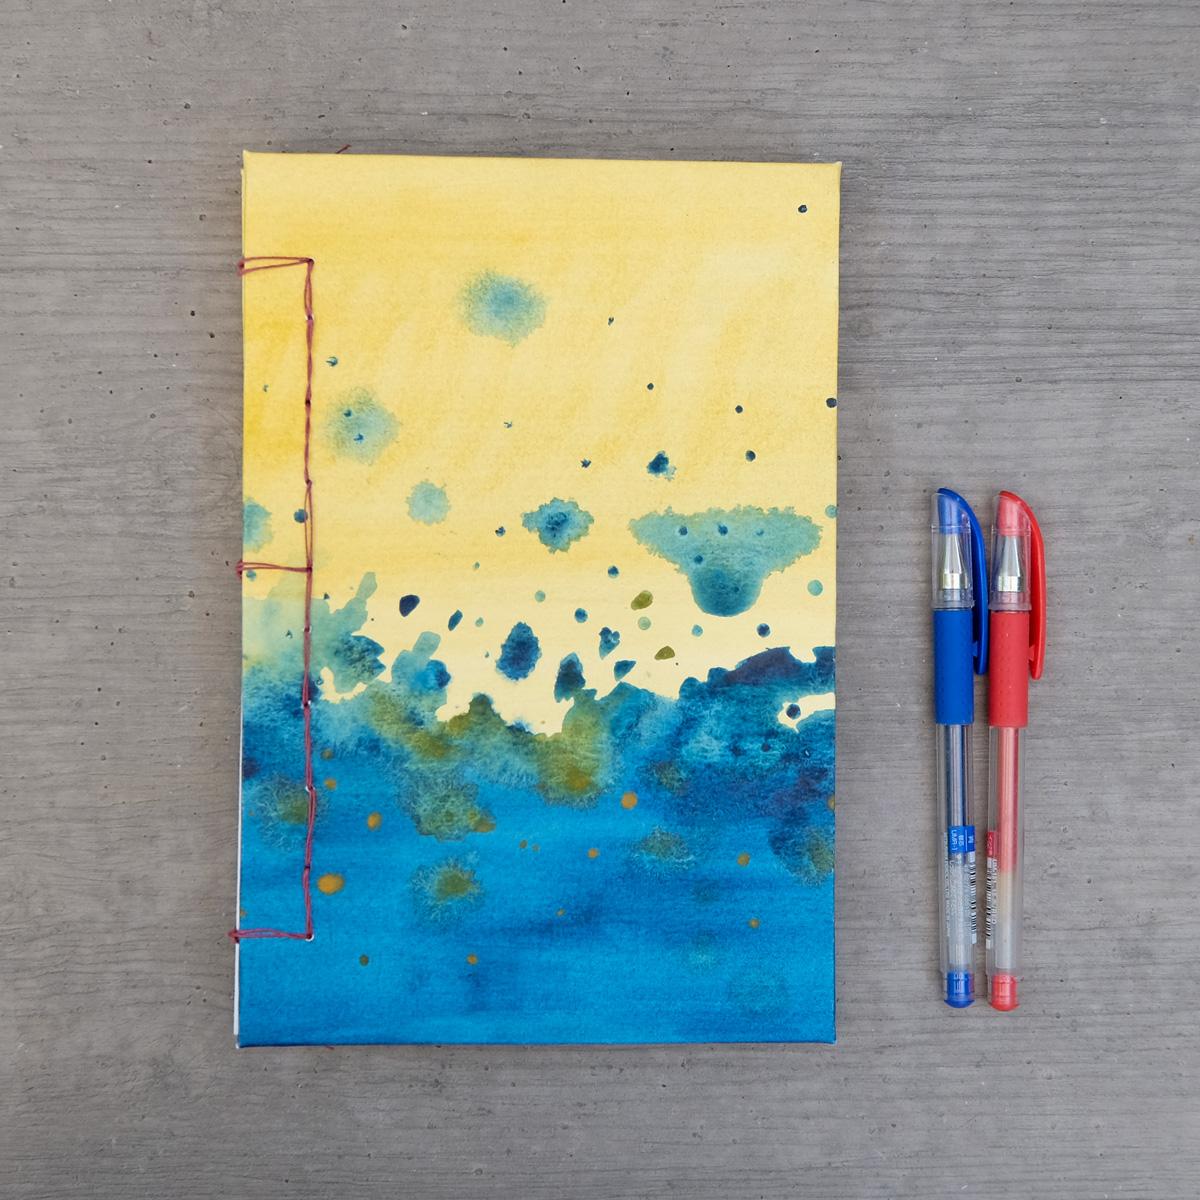 handmade-book-starry-night-1.jpg